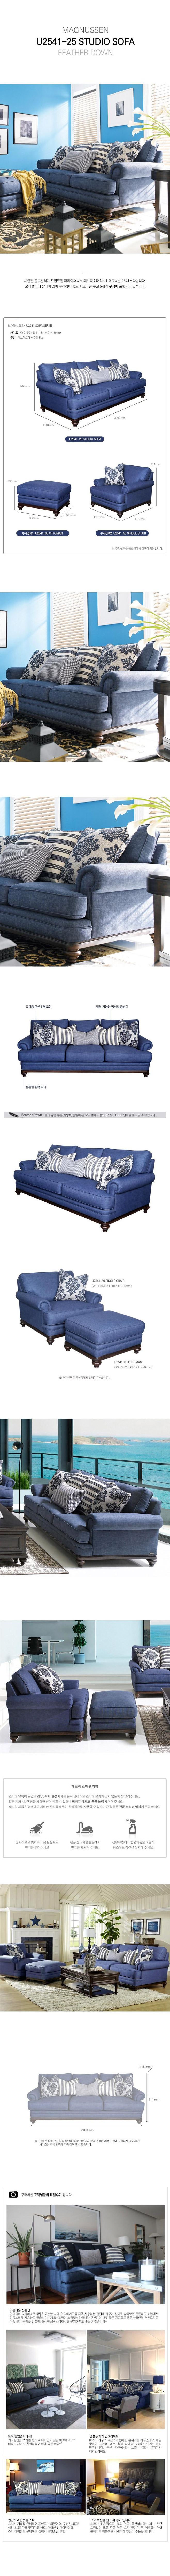 2541-25-studio-sofa_180430.jpg